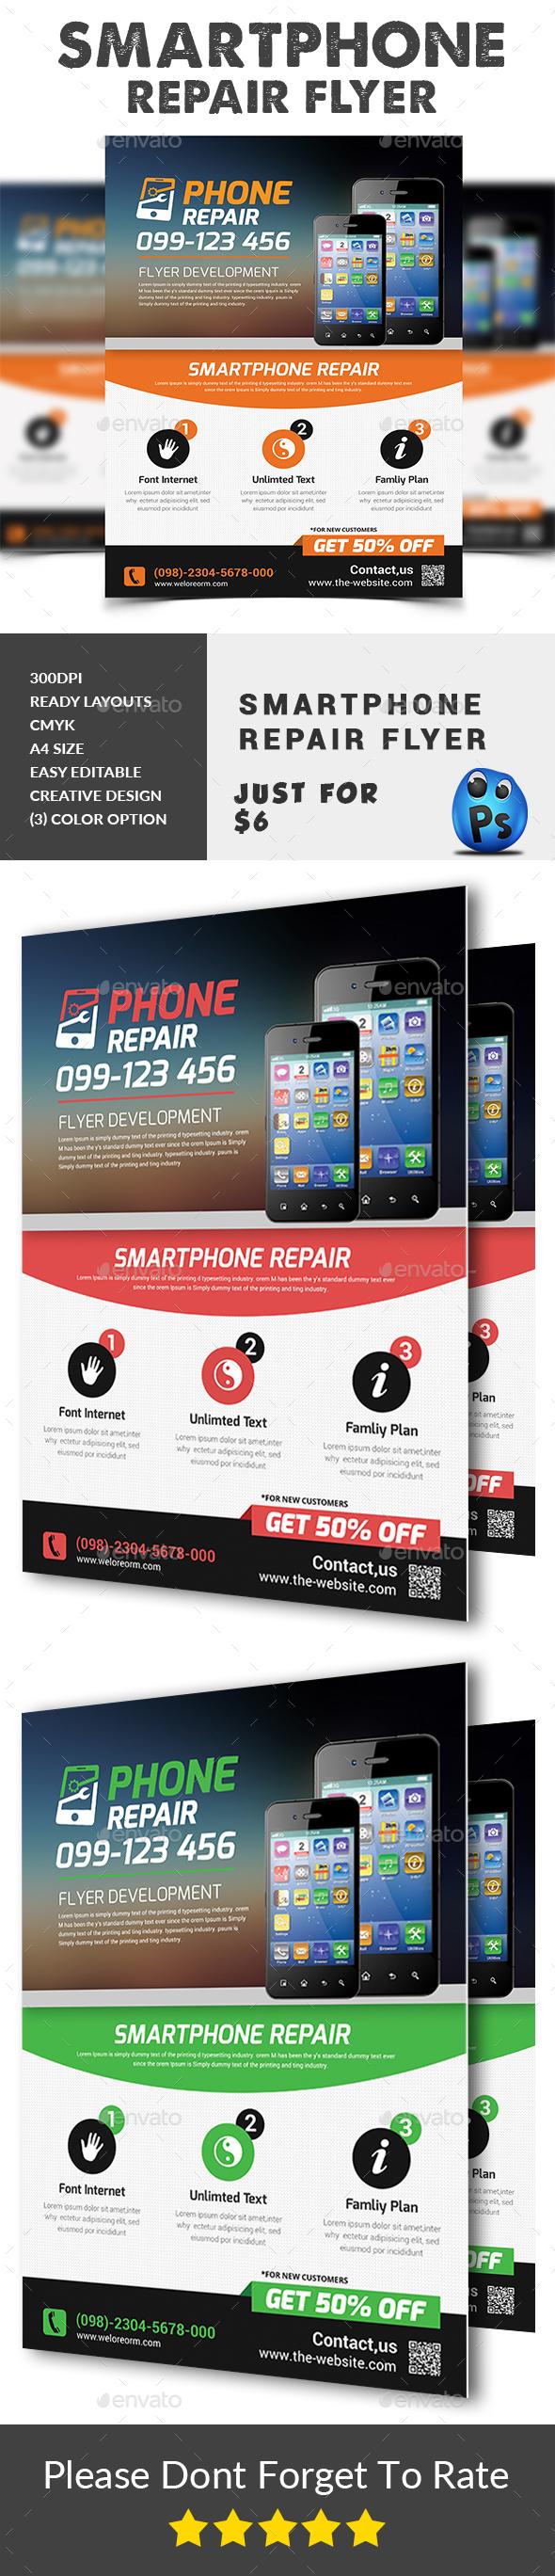 Smartphone Repair Flyer Templates - Corporate Flyers